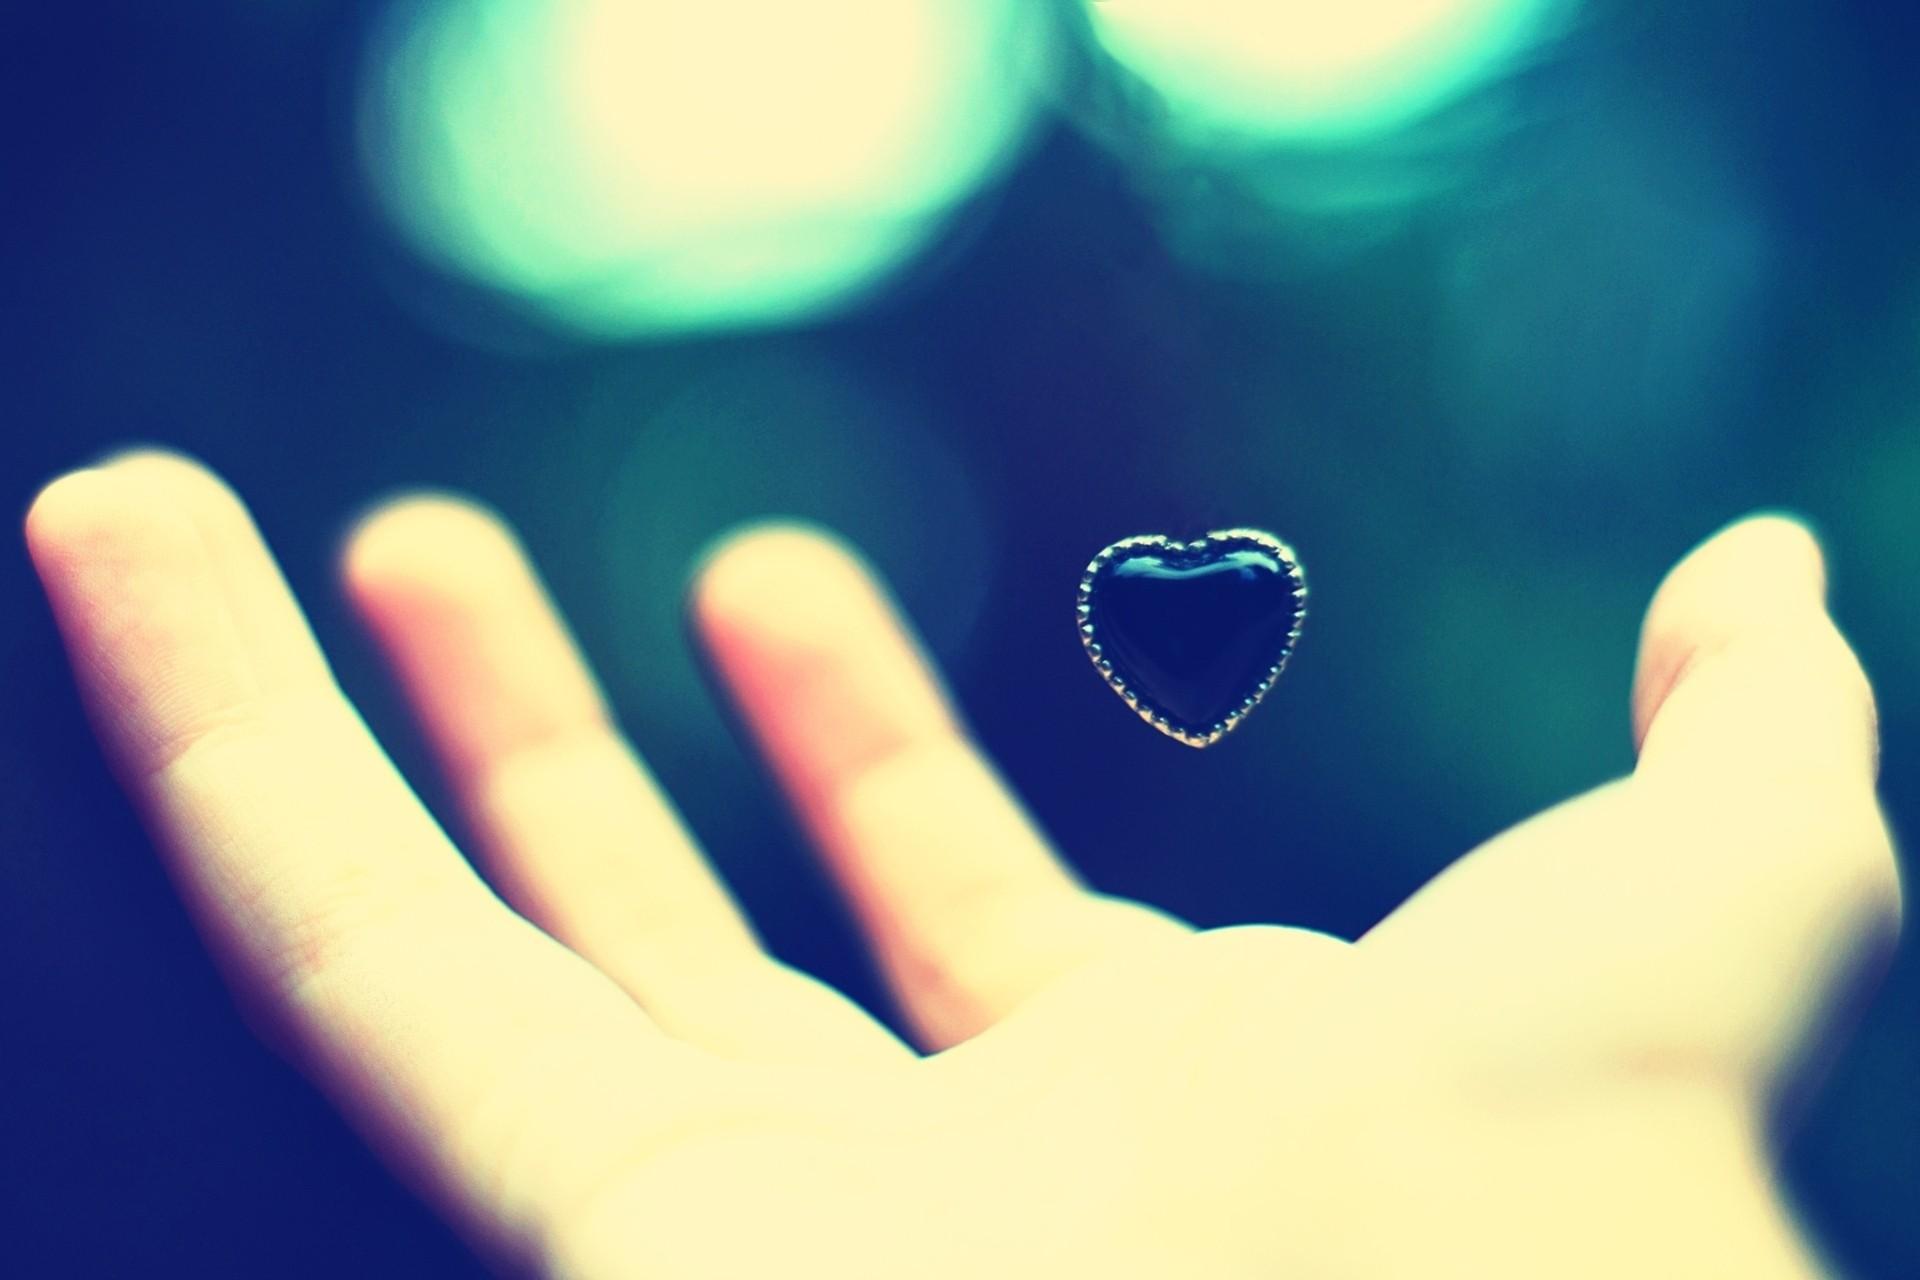 hand hearts wallpaper - HD1920×1280